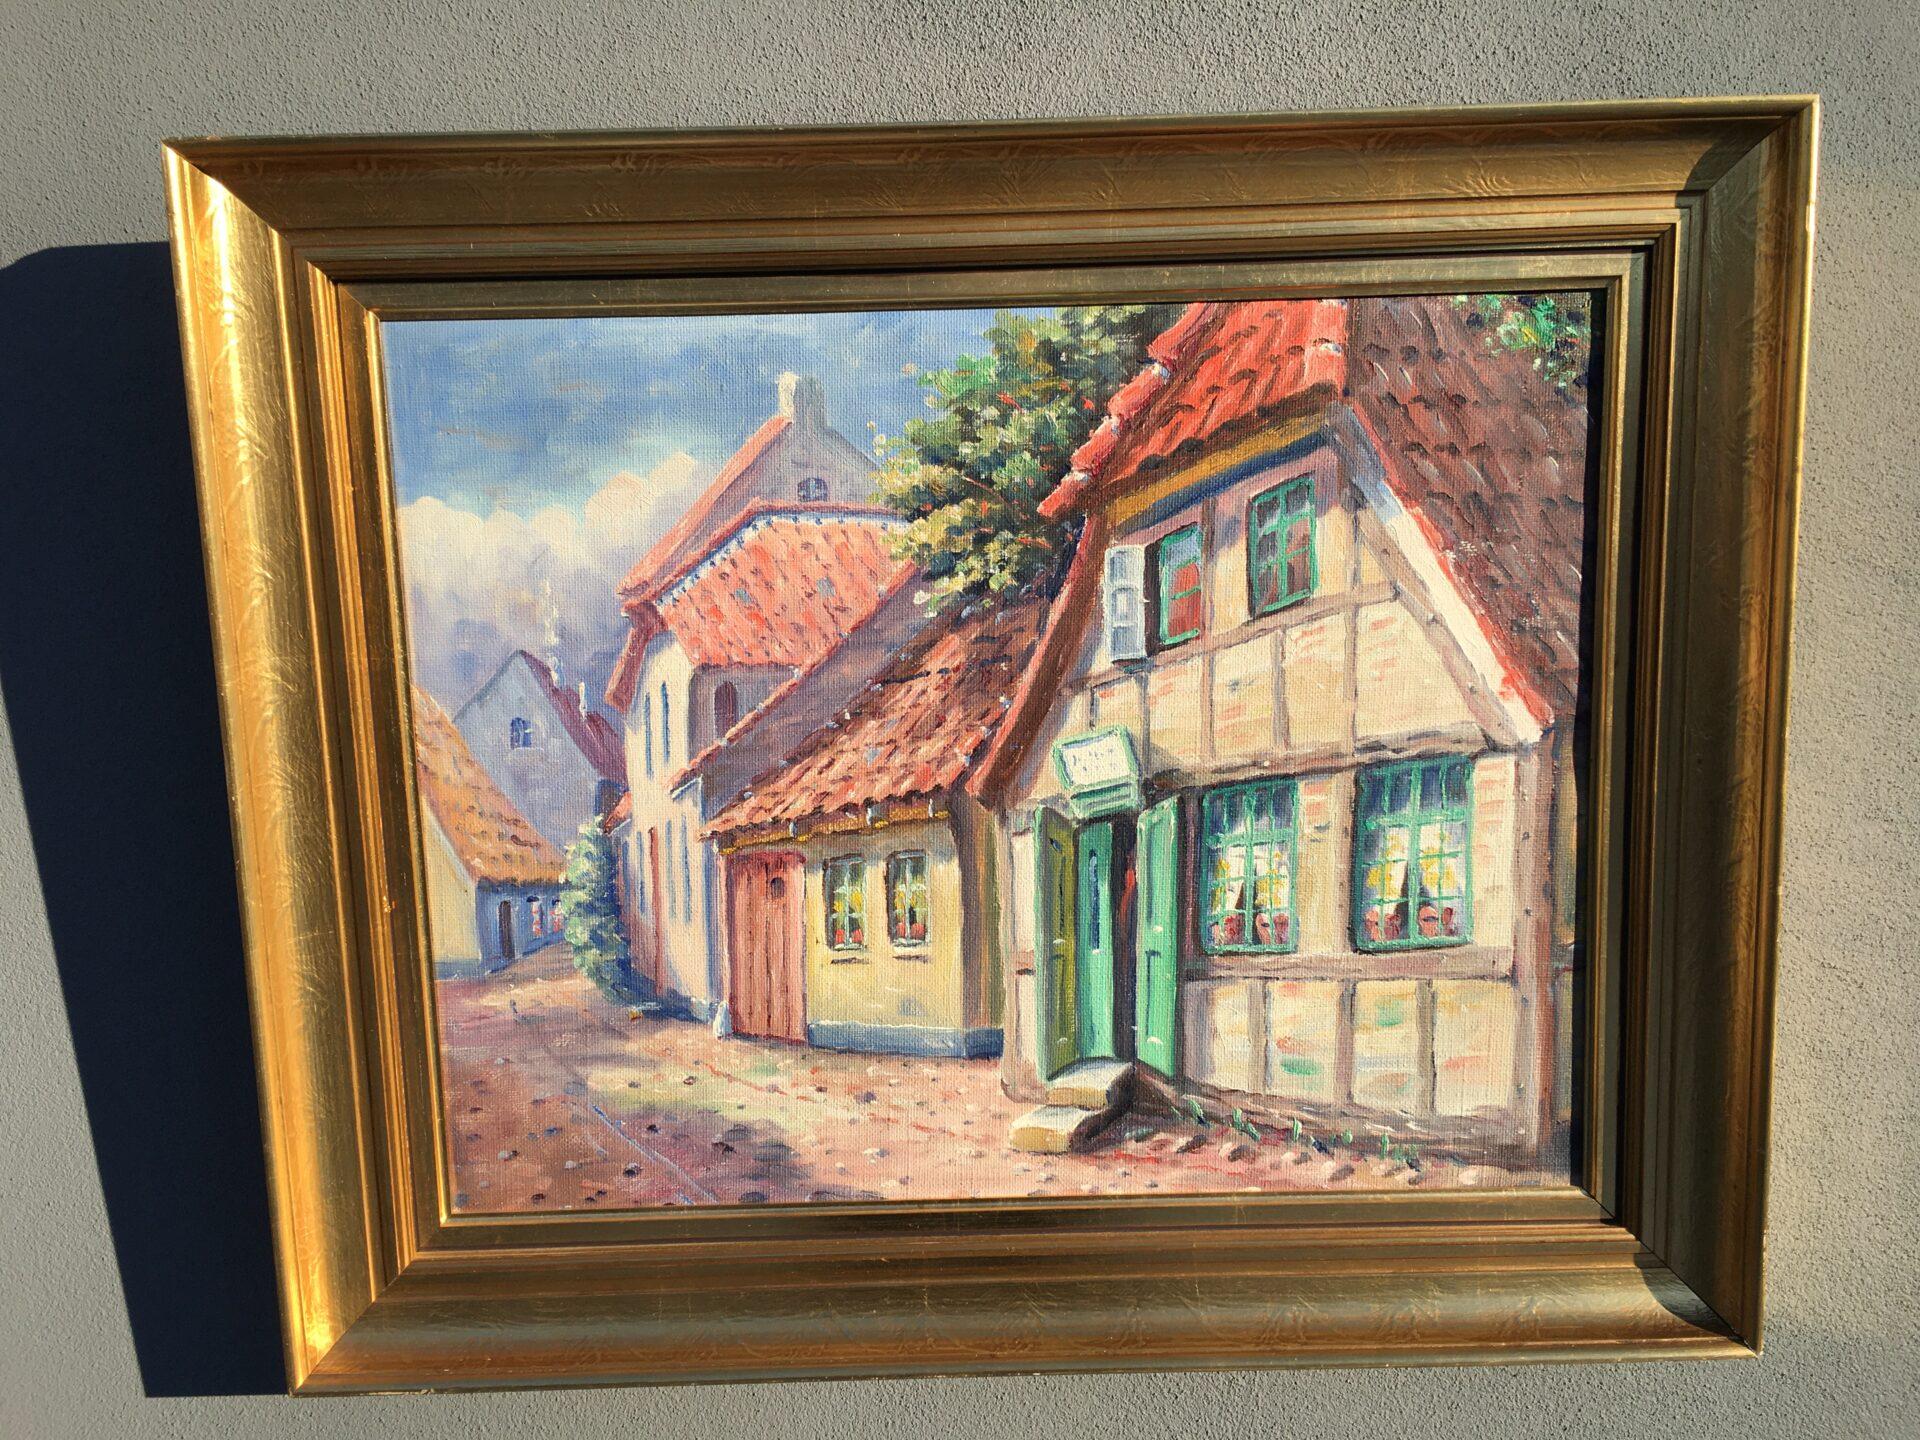 V. Albertsen, maleri, rammemål 63x79 cm, pris 400kr